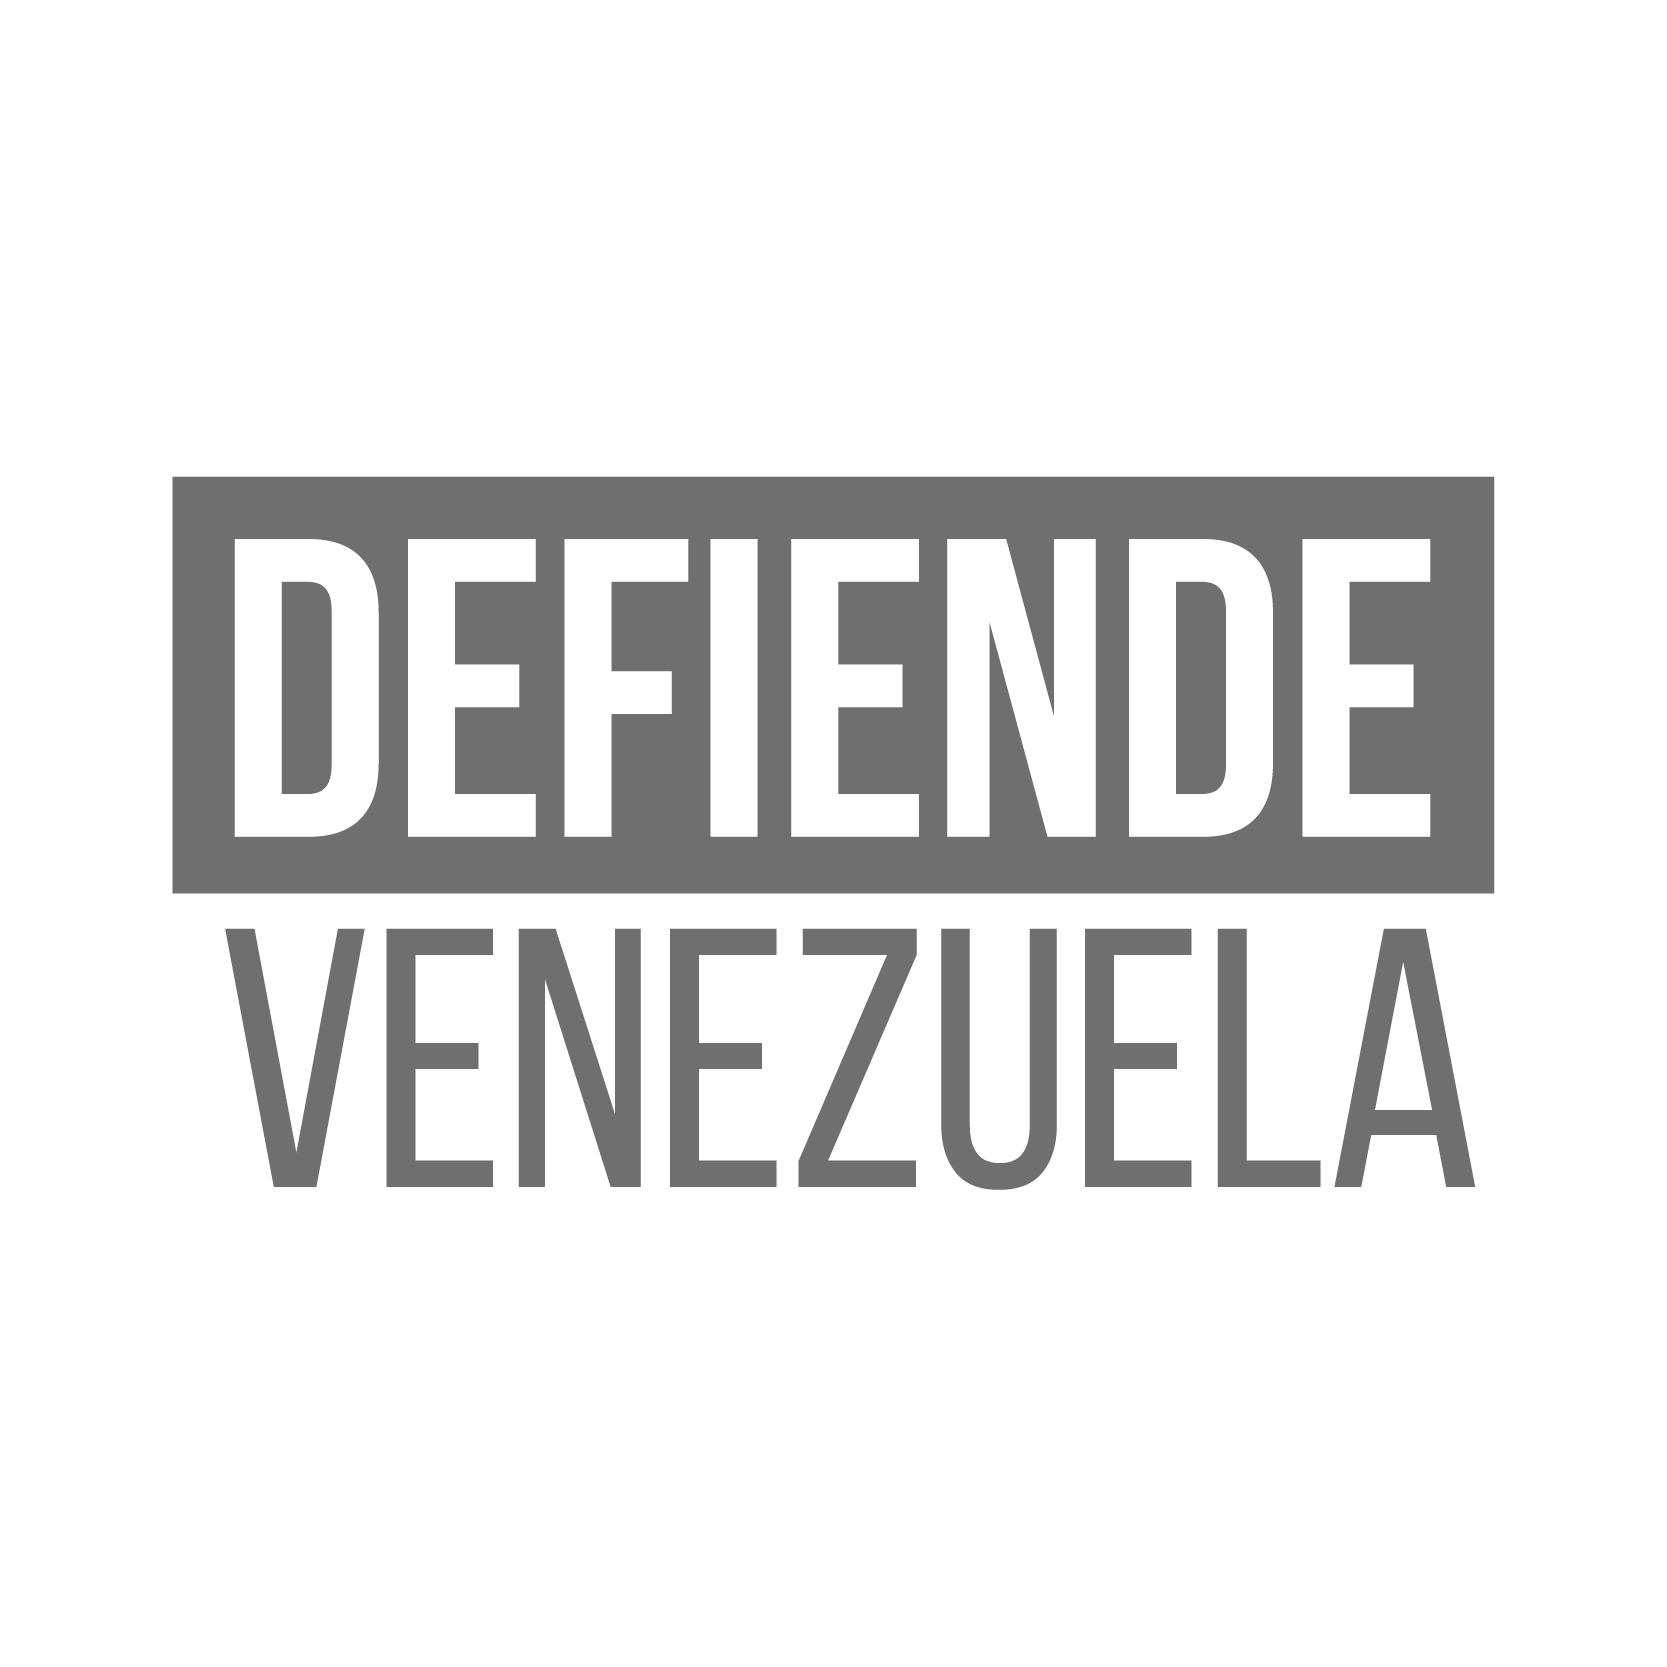 Defiende Venezuela ZITRO Graphic Designer